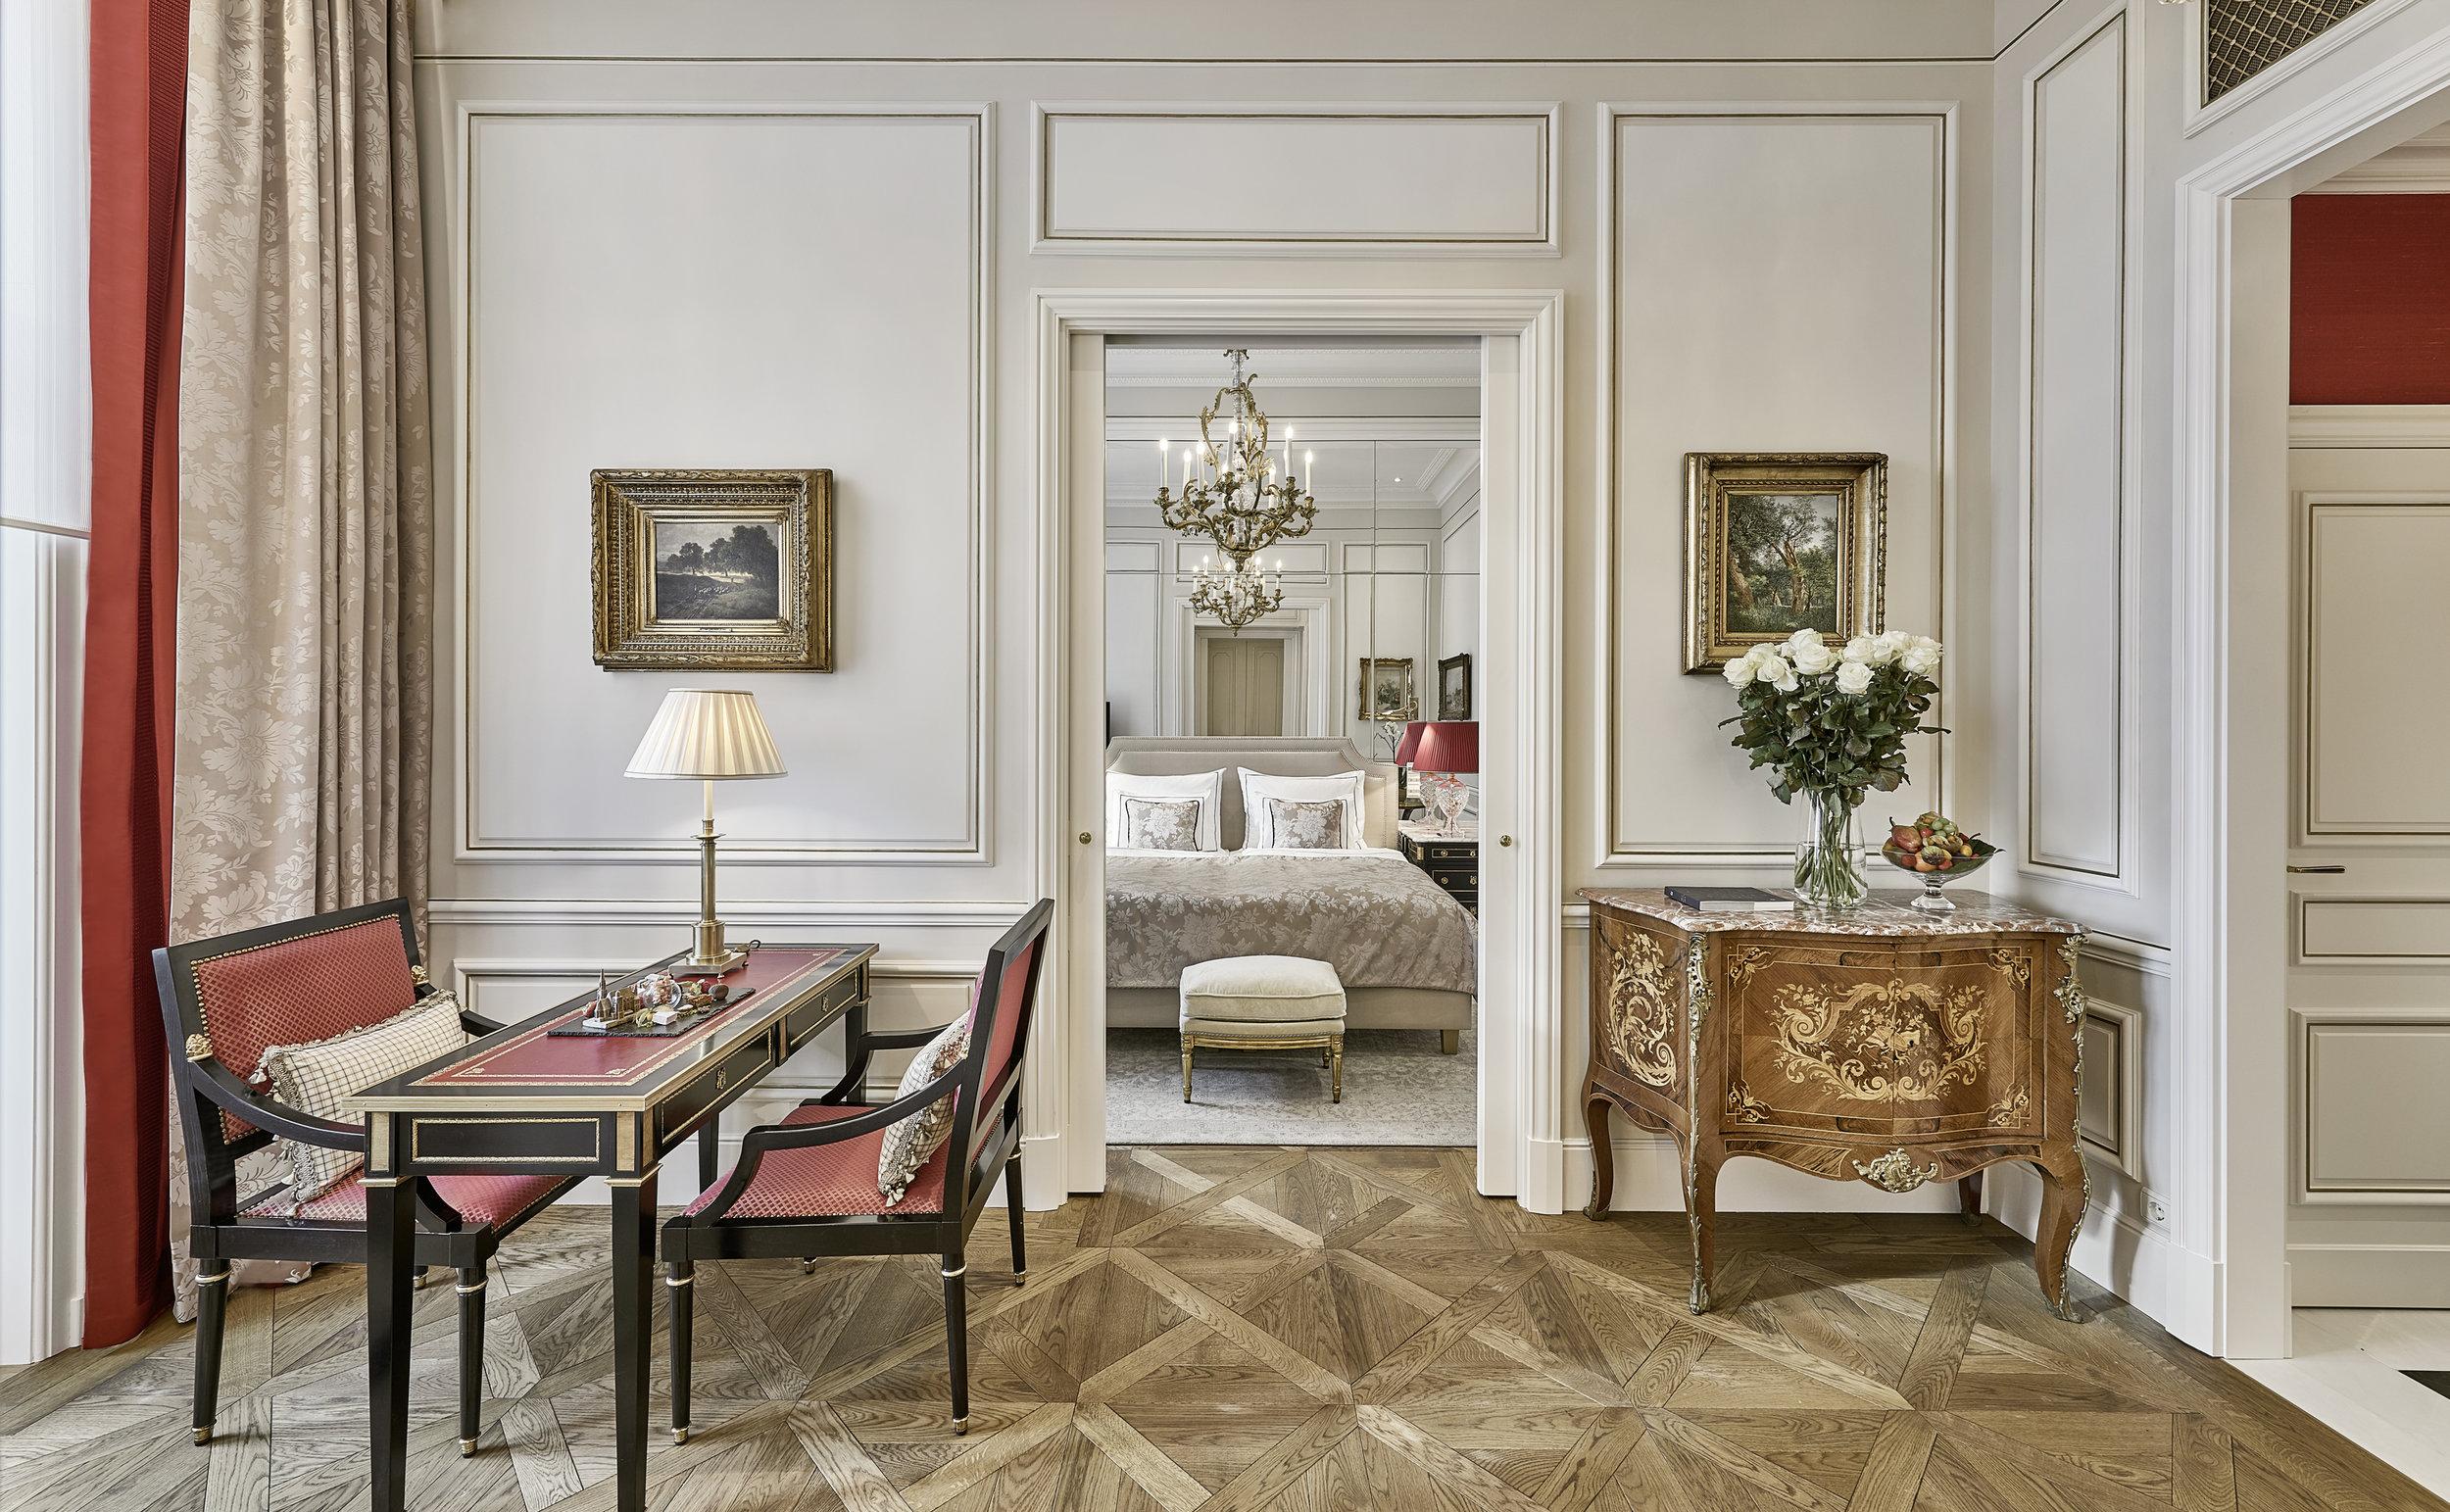 Hotel Sacher Wien 3.jpg